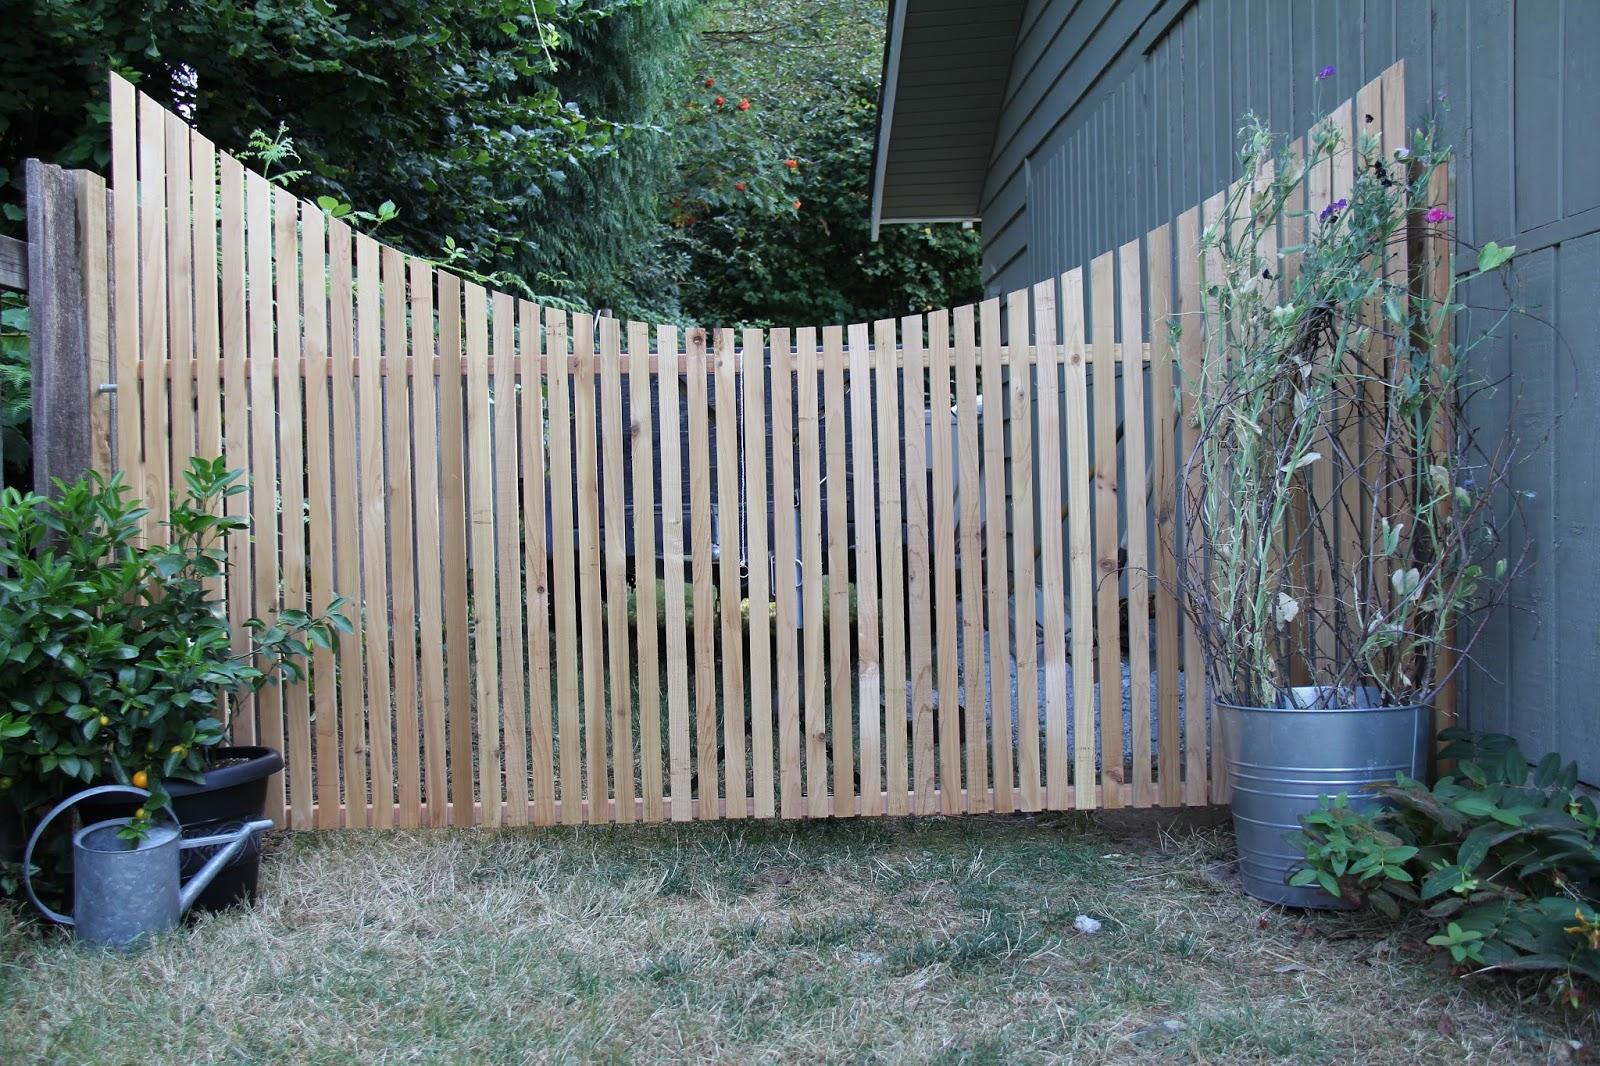 dirt digging sisters: Garden Gate DIY project